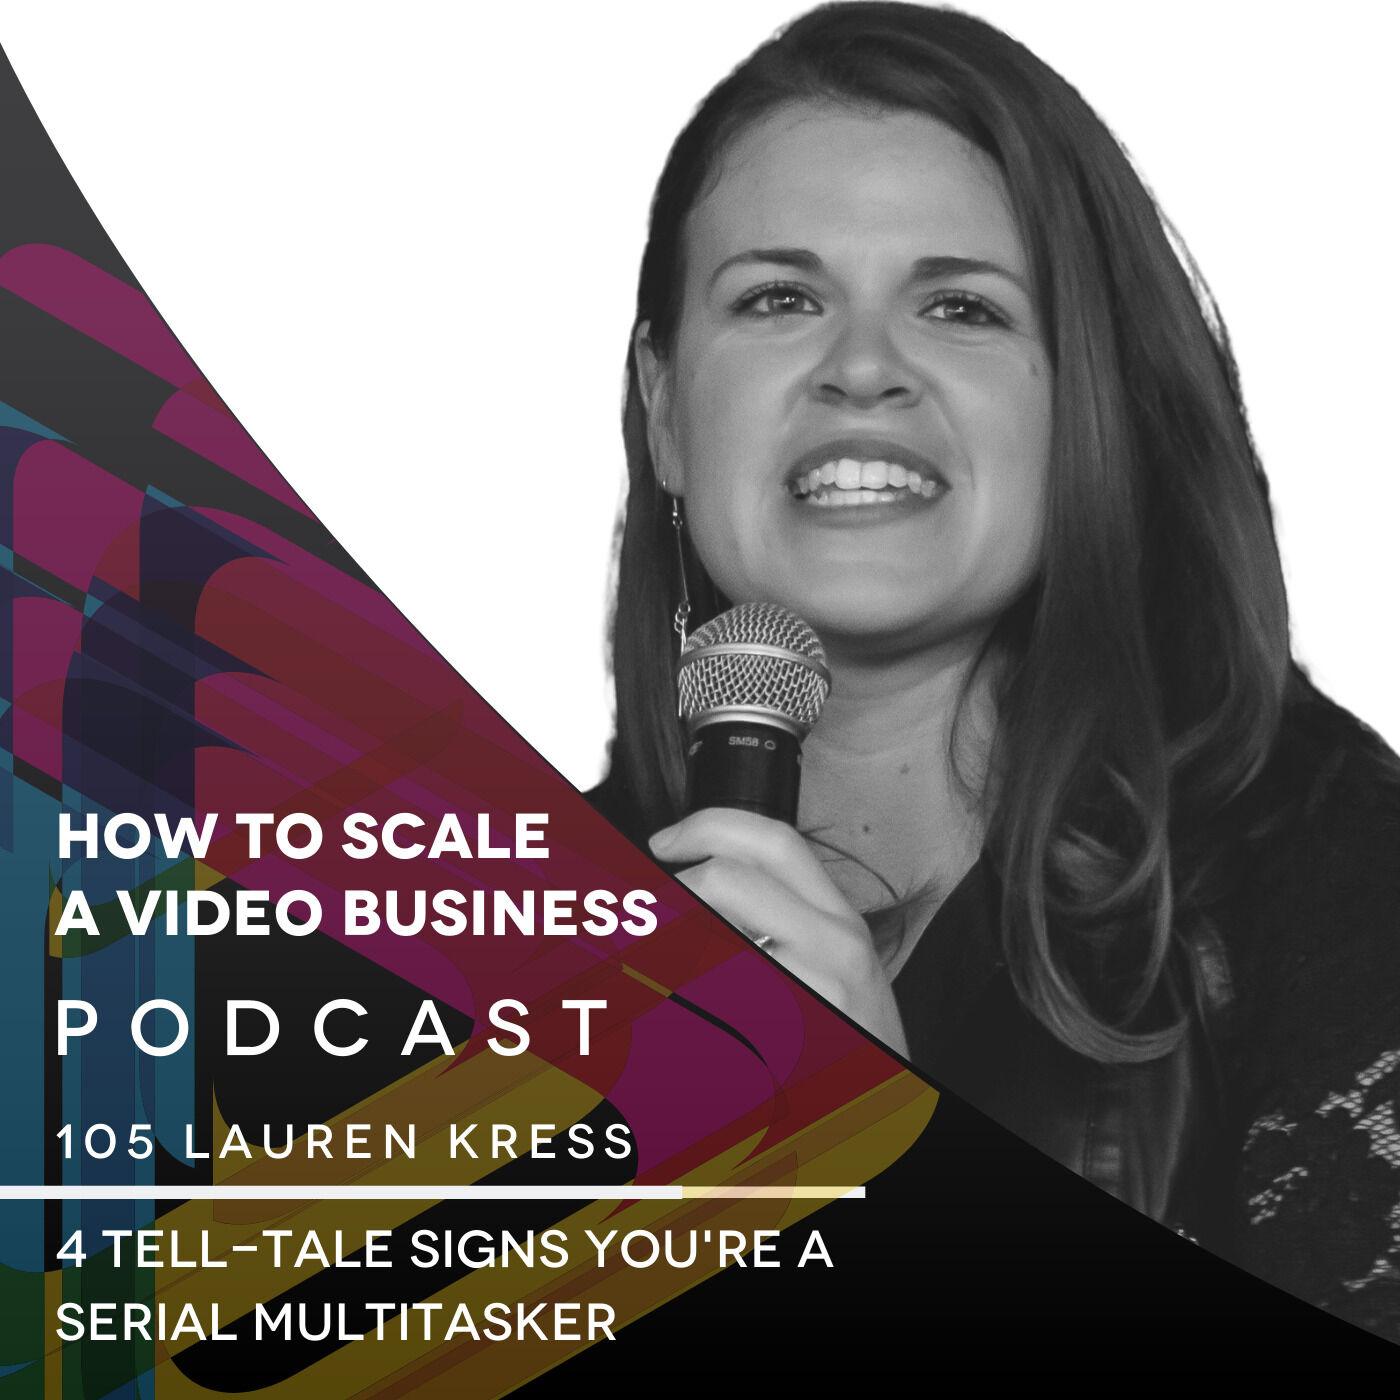 4 tell-tale signs you're a serial multitasker - EP #105 - Lauren Kress